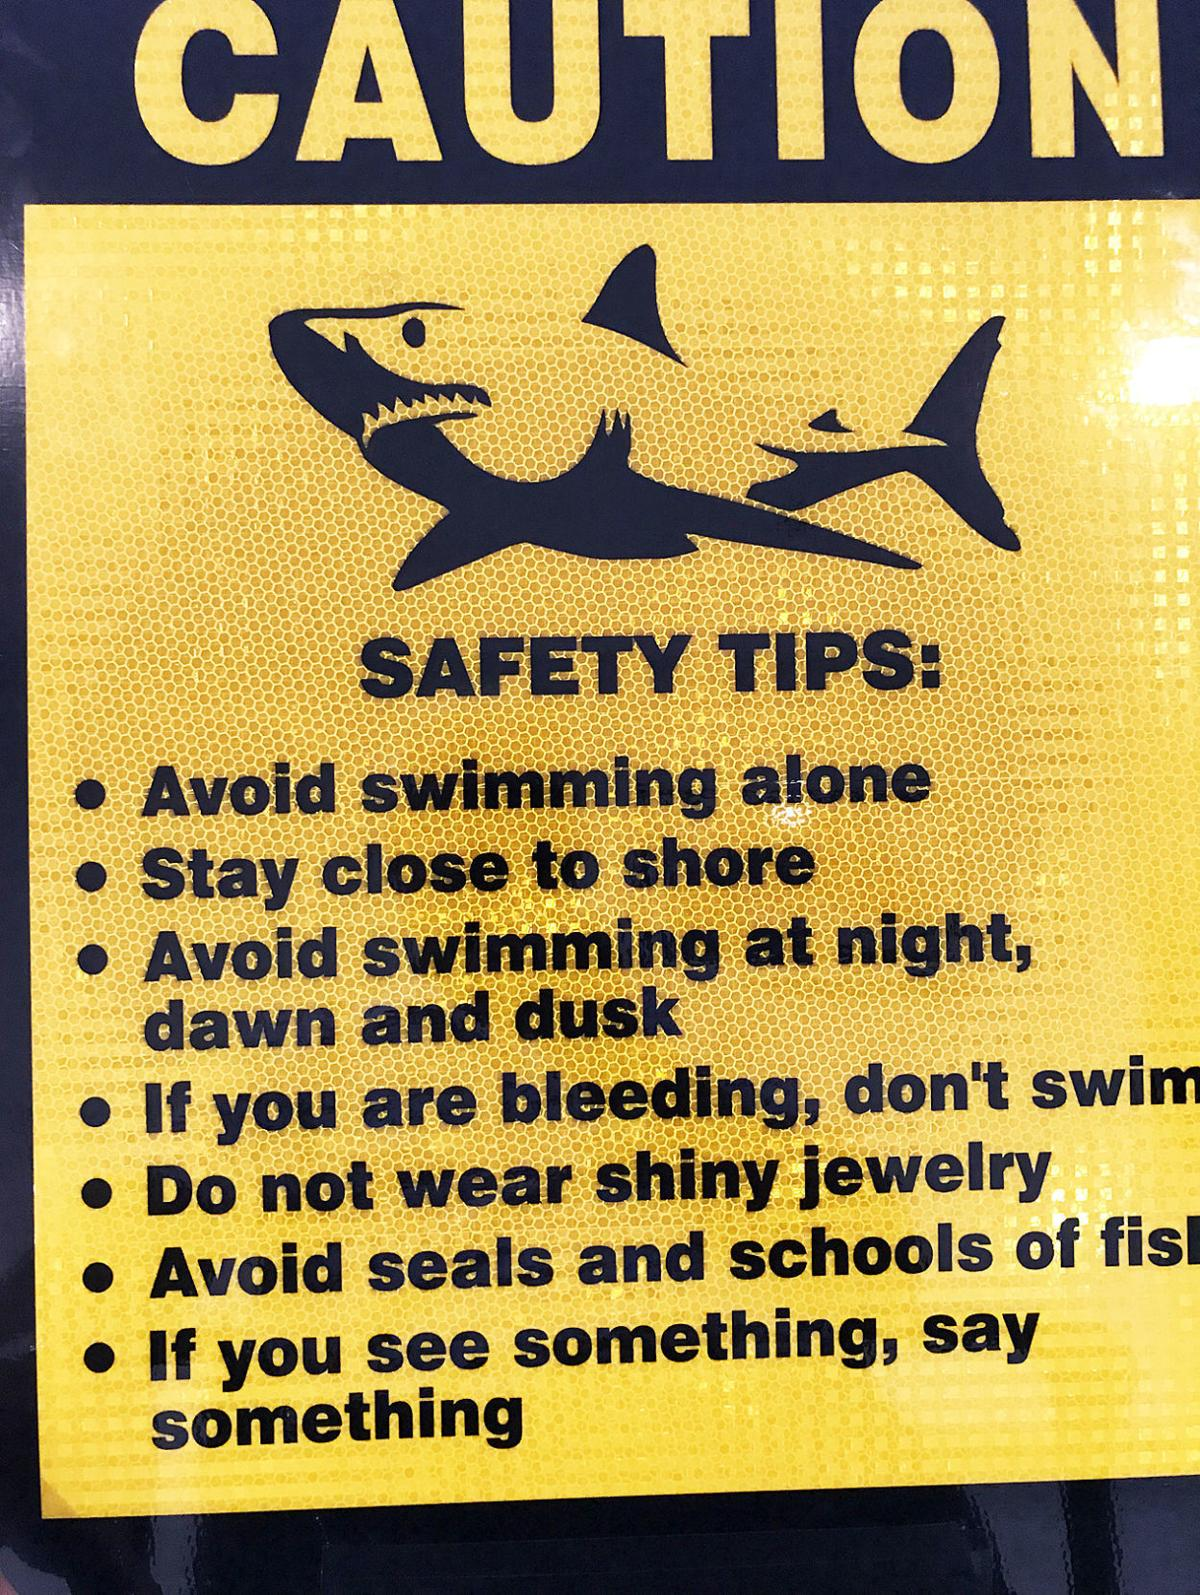 Bourne DNR Chief Offers Shark Sighting Protocols